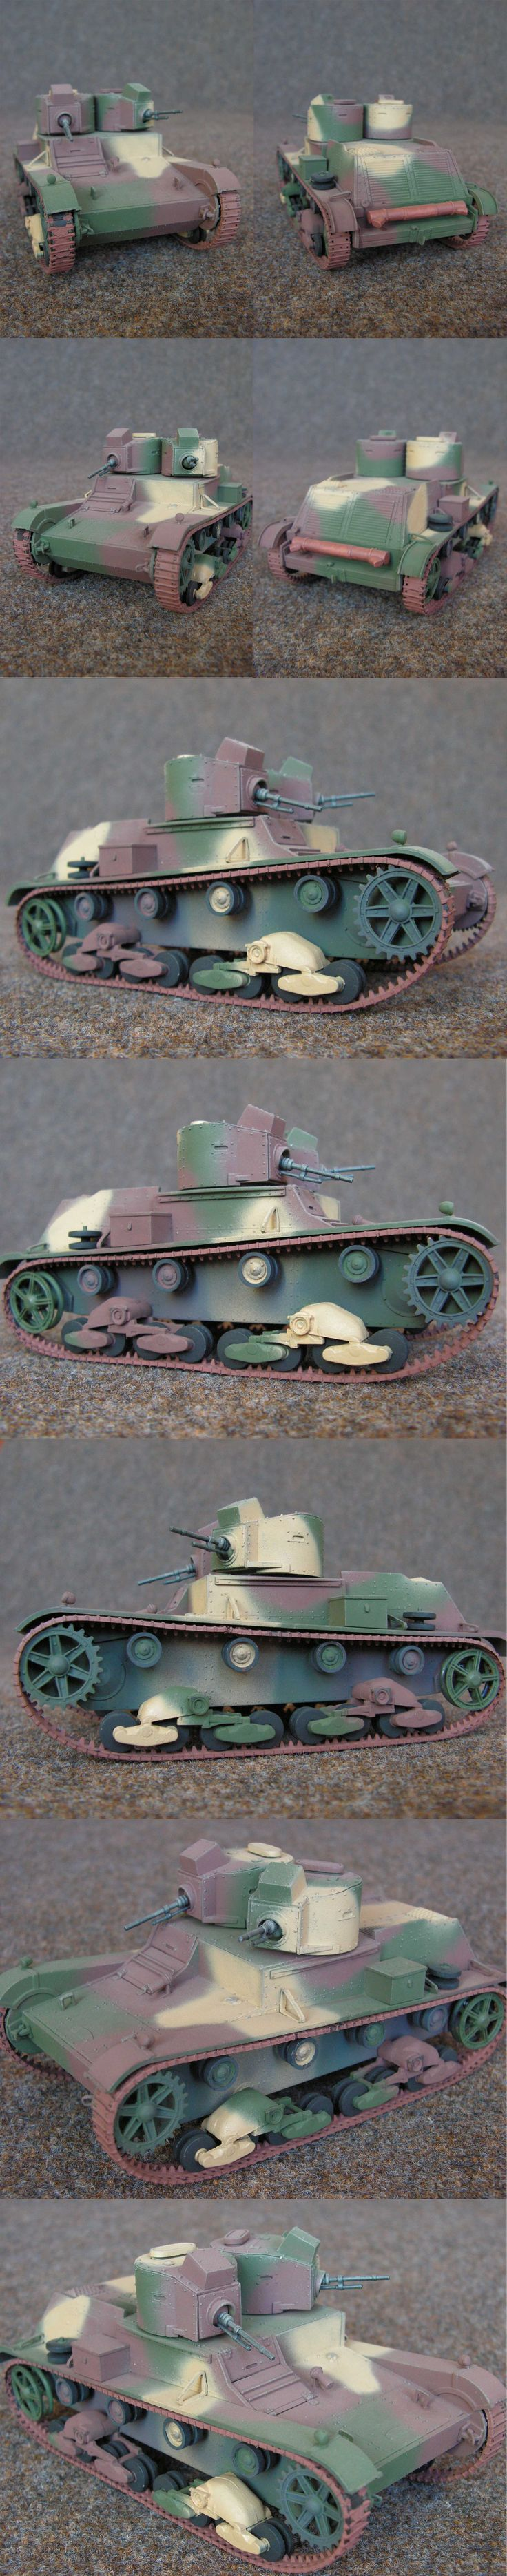 7 TP 1939 Mirage